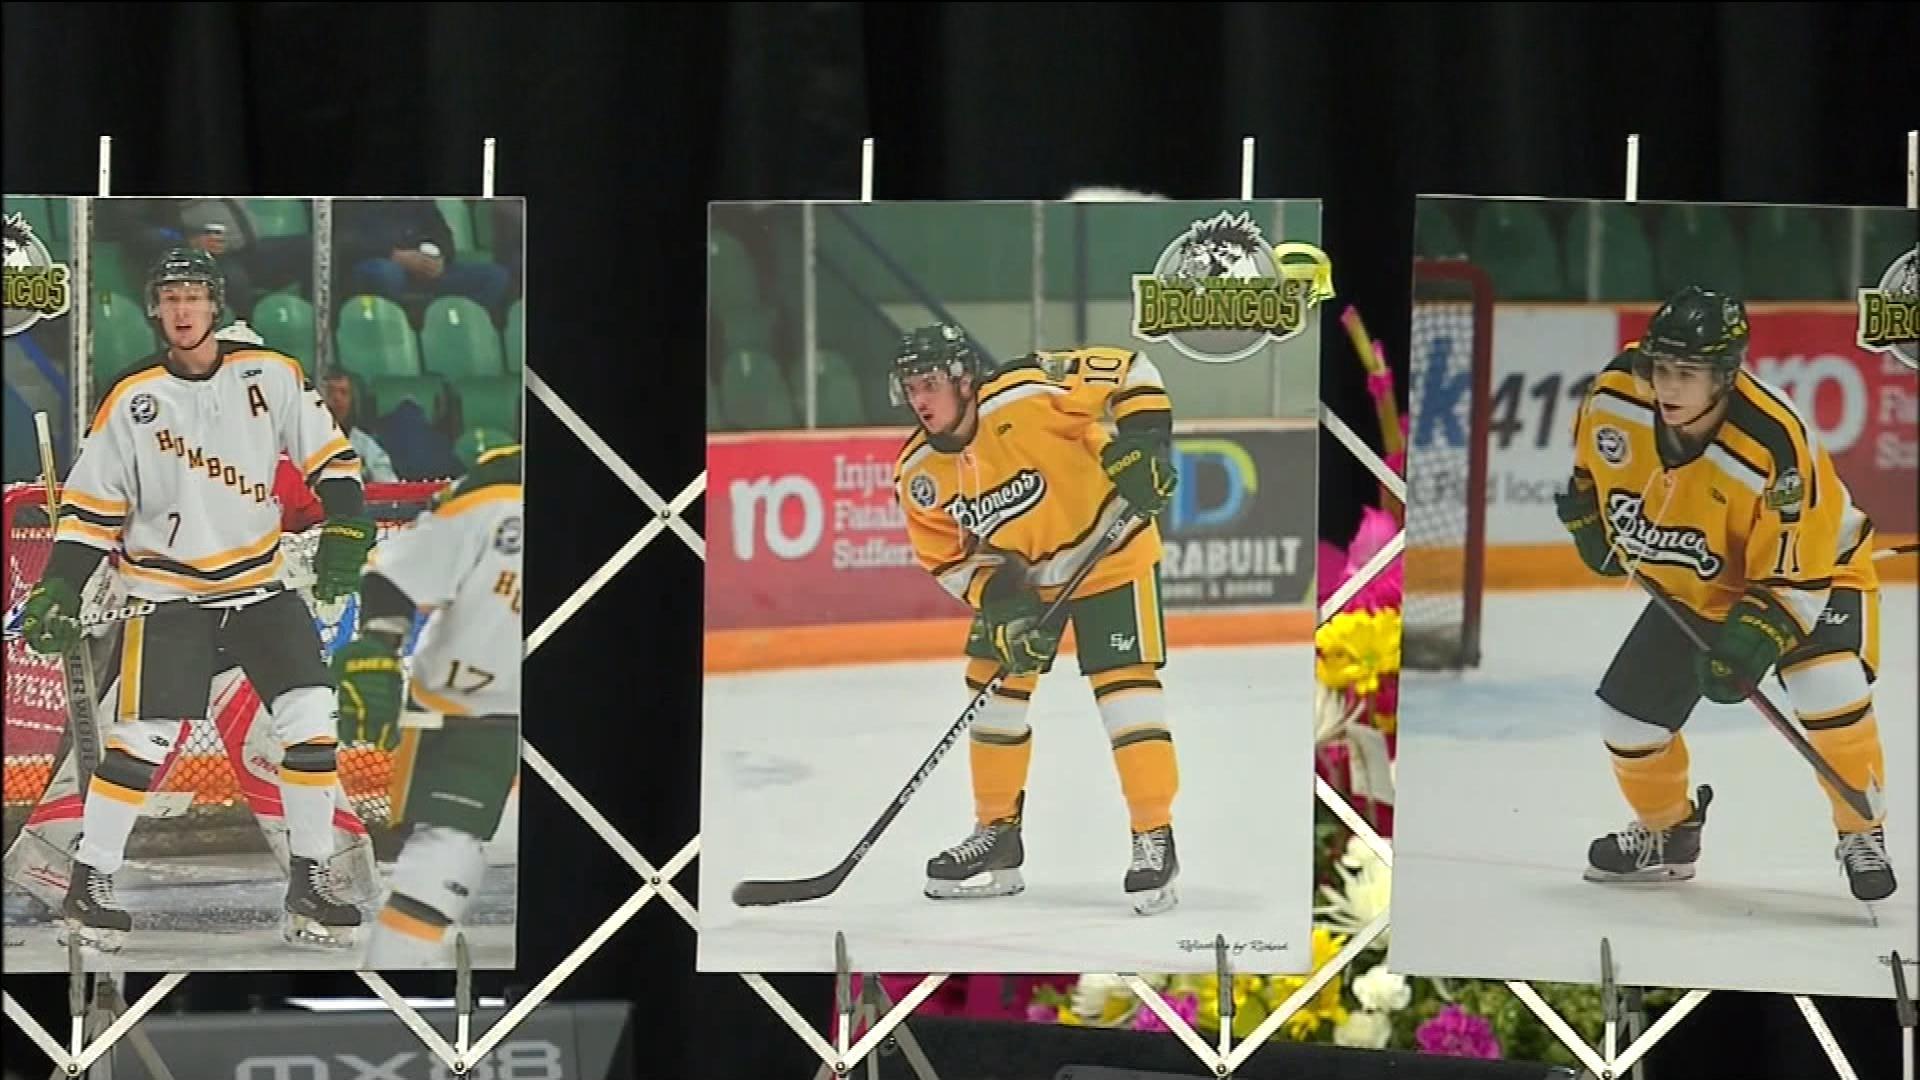 NHL, hockey community supporting Humboldt Broncos